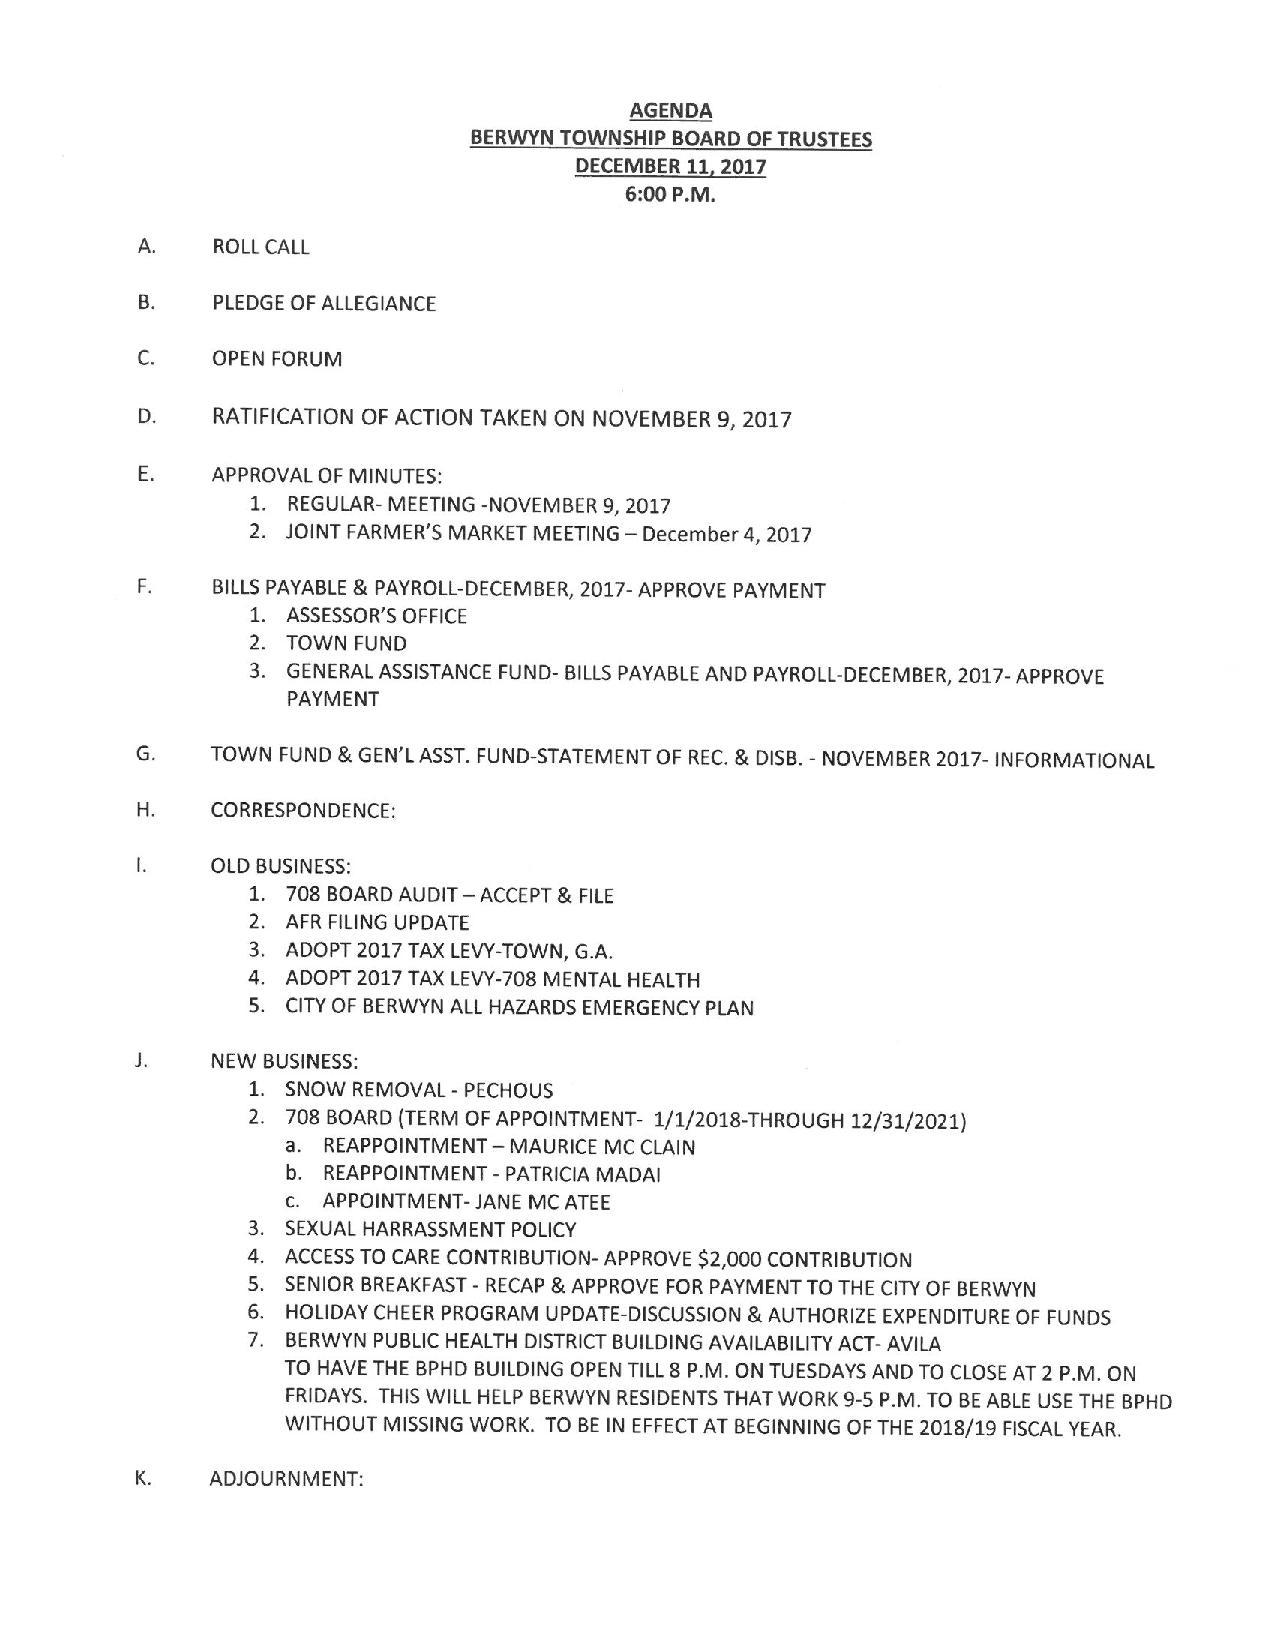 TS_Agenda_12.11.2017-page-001.jpg